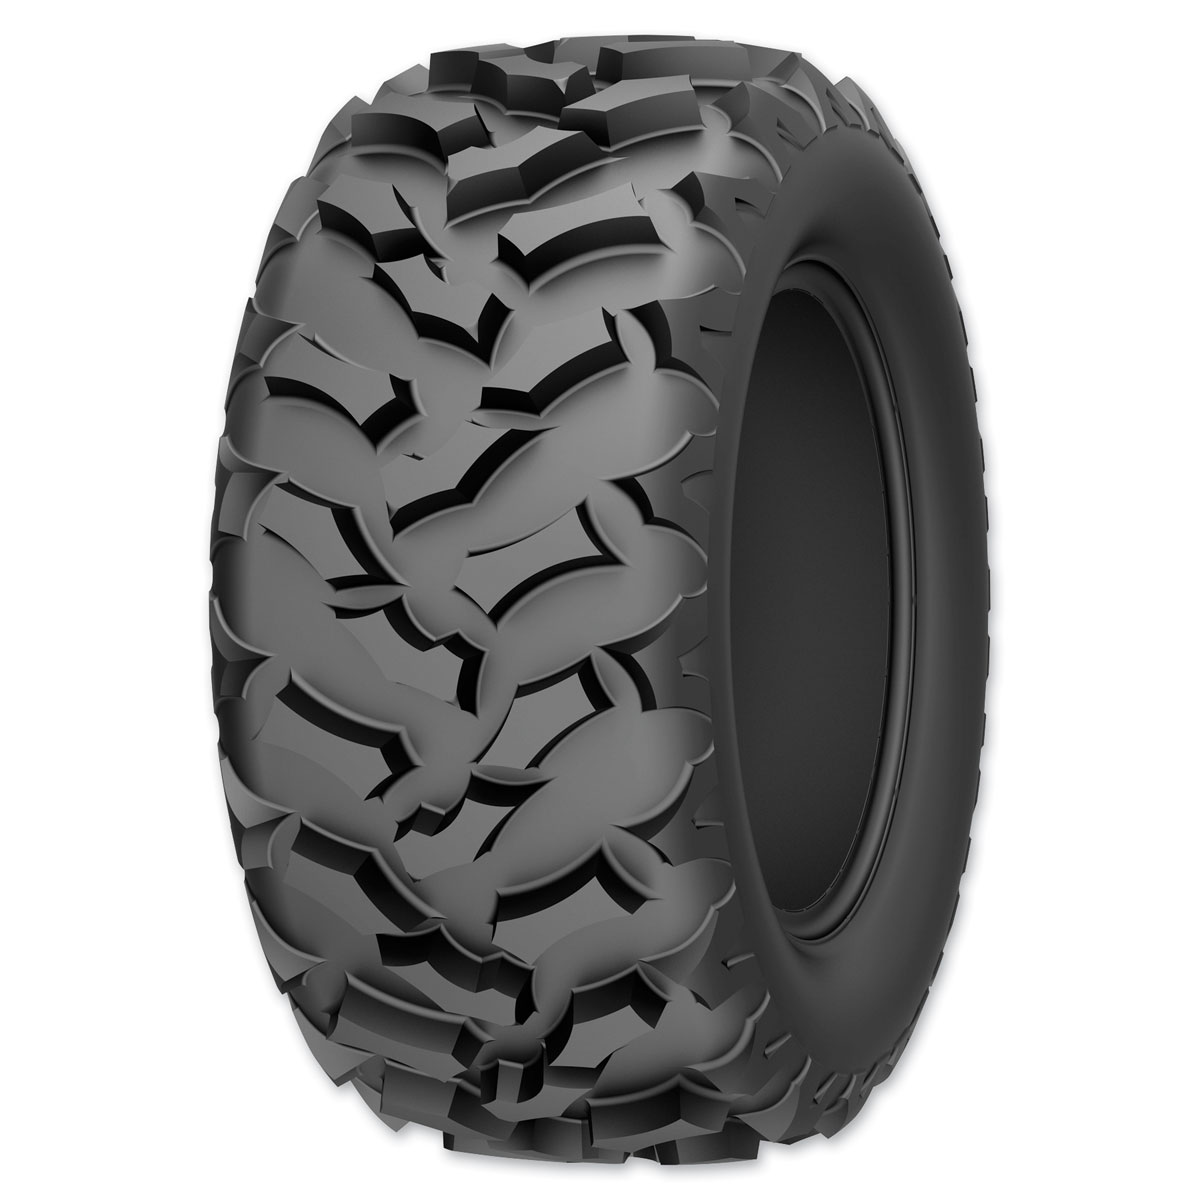 Kenda Tires Mastodon 26X9R-14 Front/Rear Tire